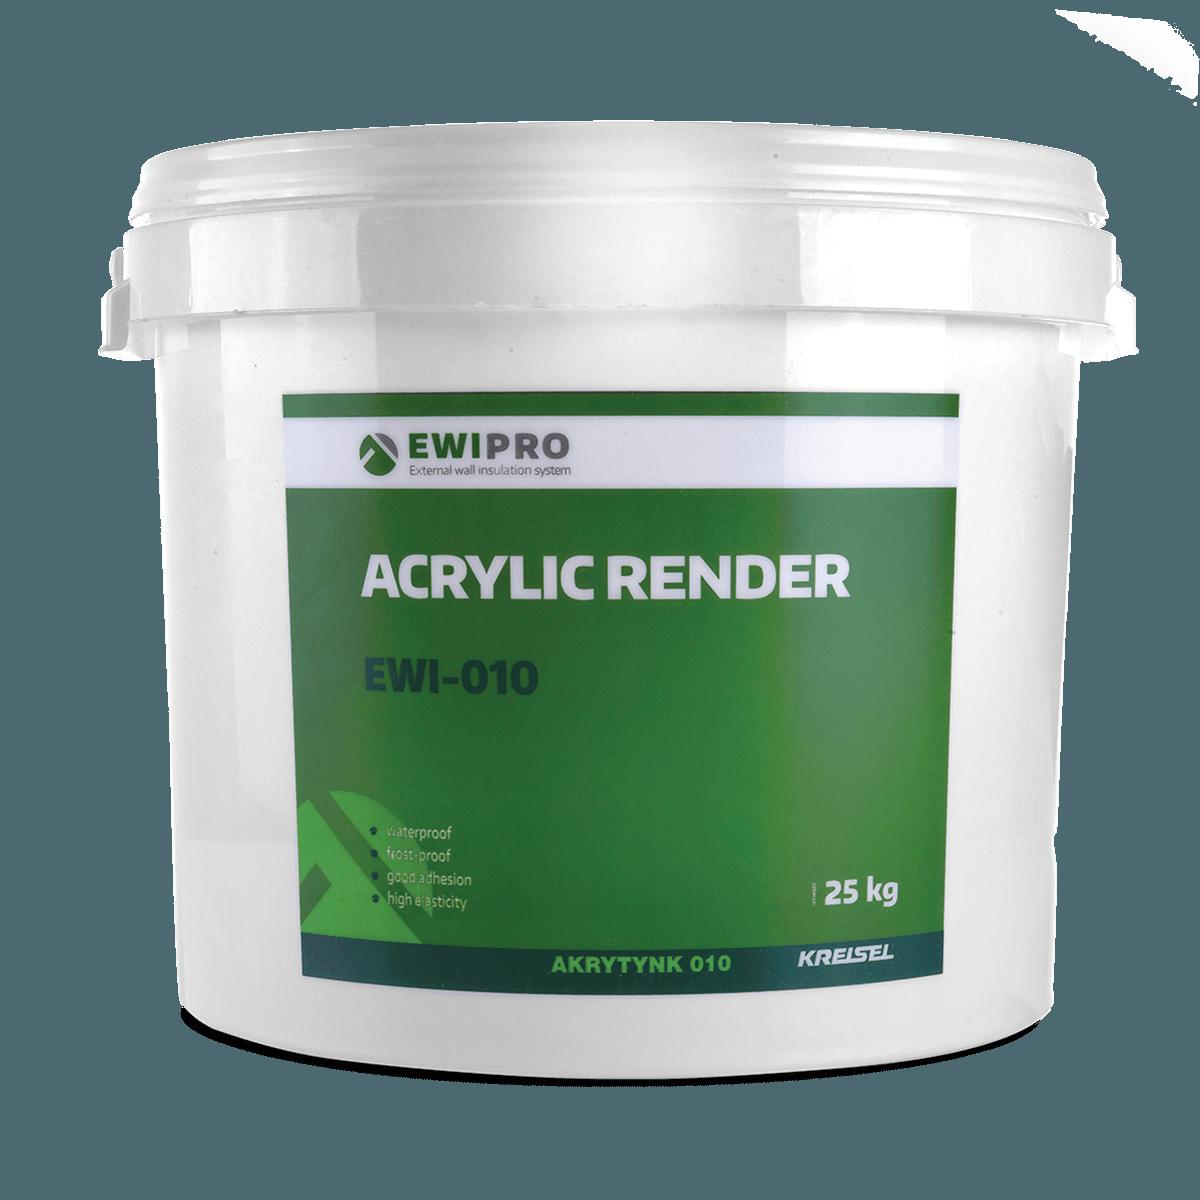 Acrylic Render EWI-010 - EWI Pro